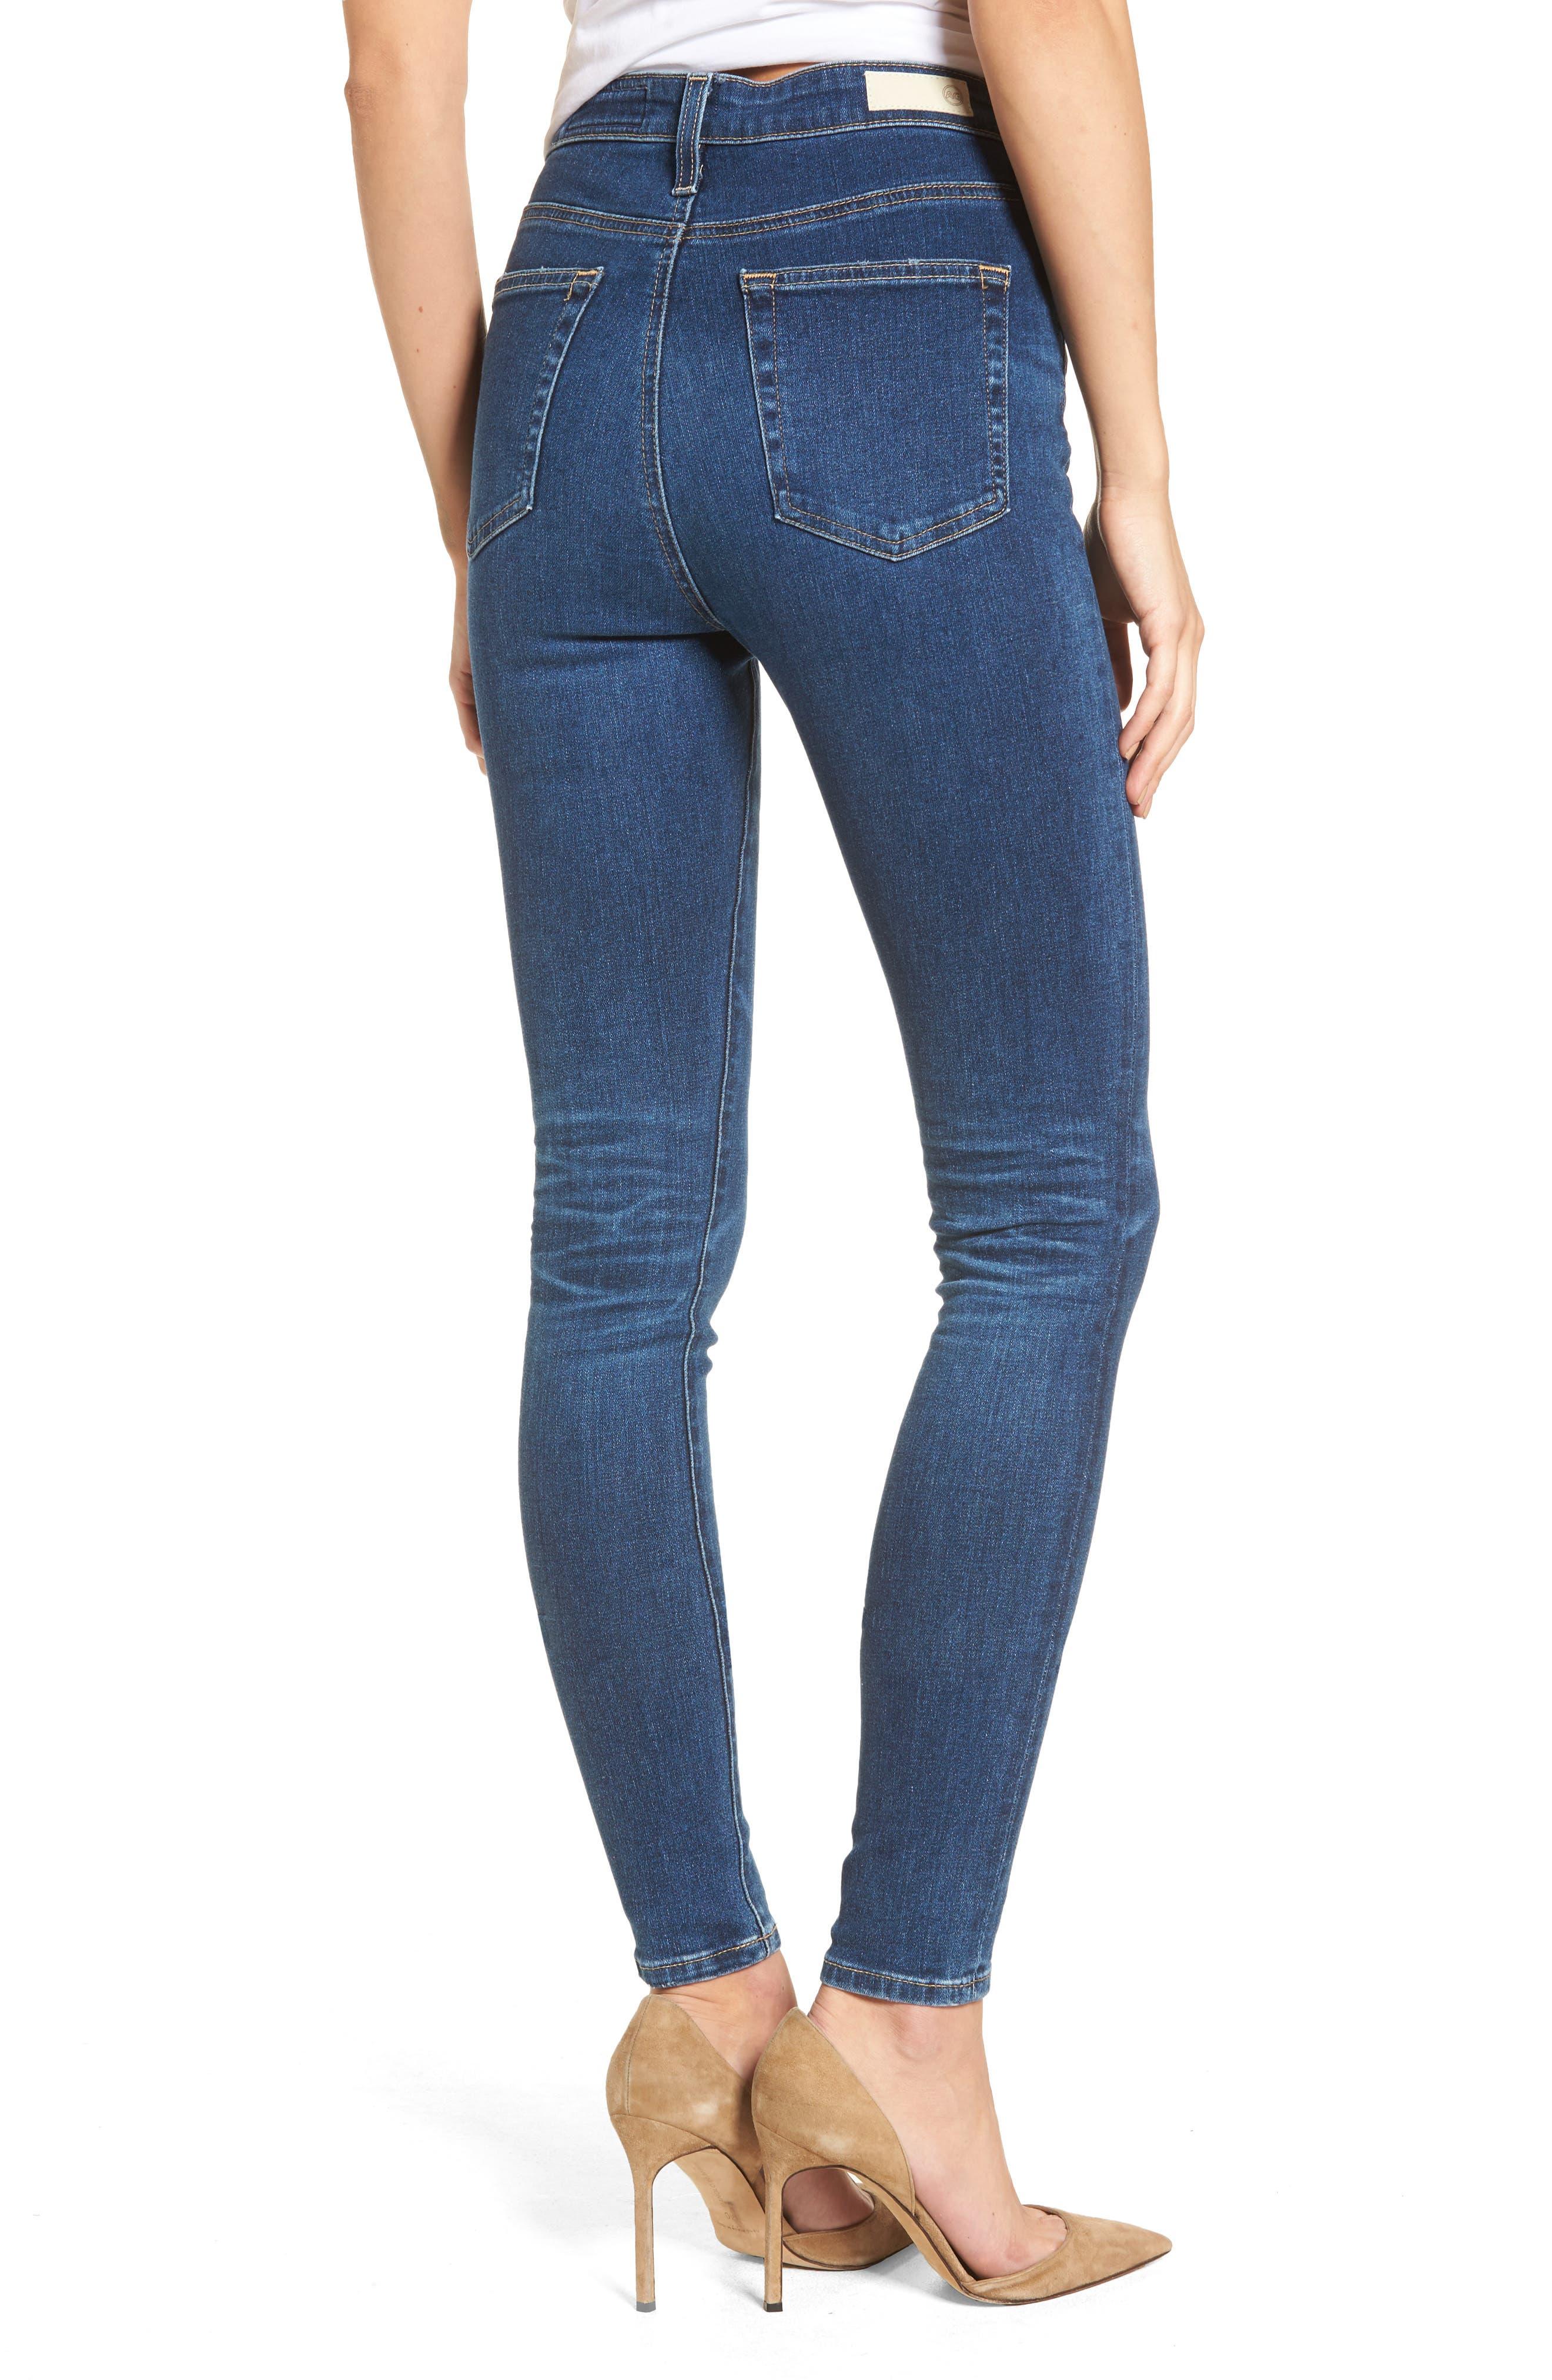 Mila High Waist Skinny Jeans,                             Alternate thumbnail 2, color,                             473